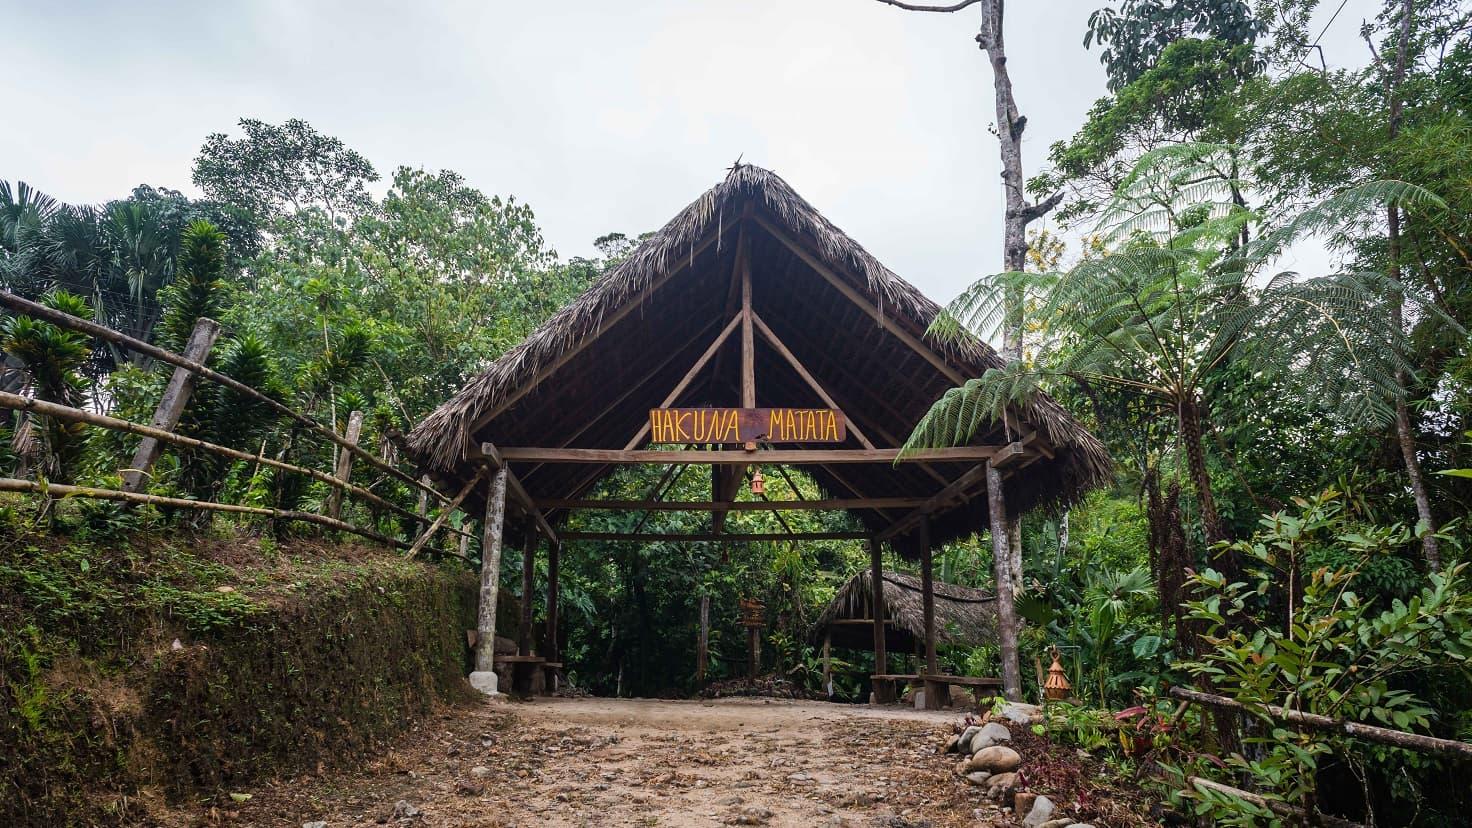 Hakuna Matata Rainforest Lodge, Ecuador